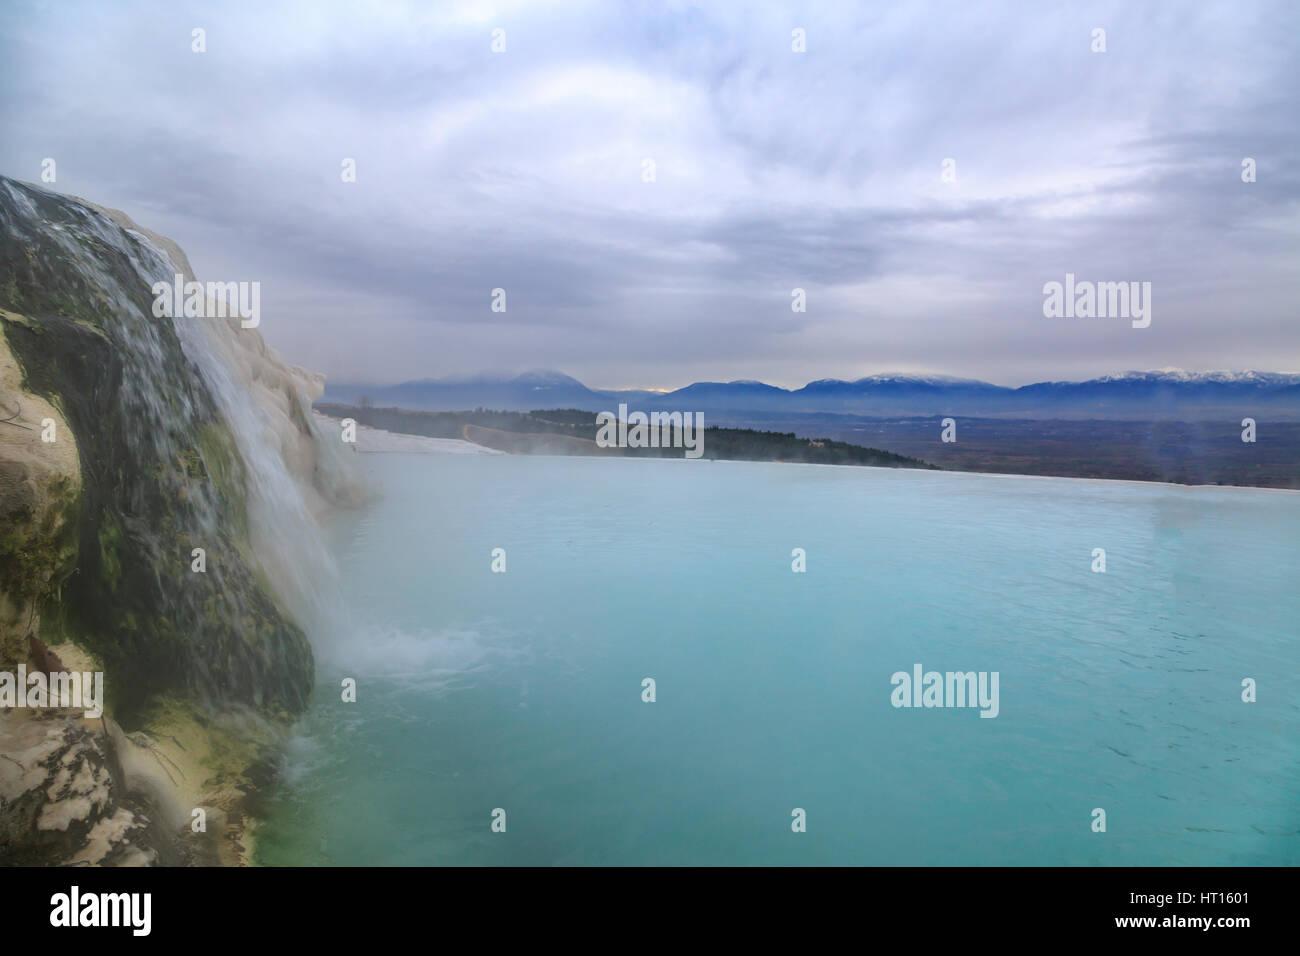 Water falling in travertine in Pamukkale in winter - Stock Image